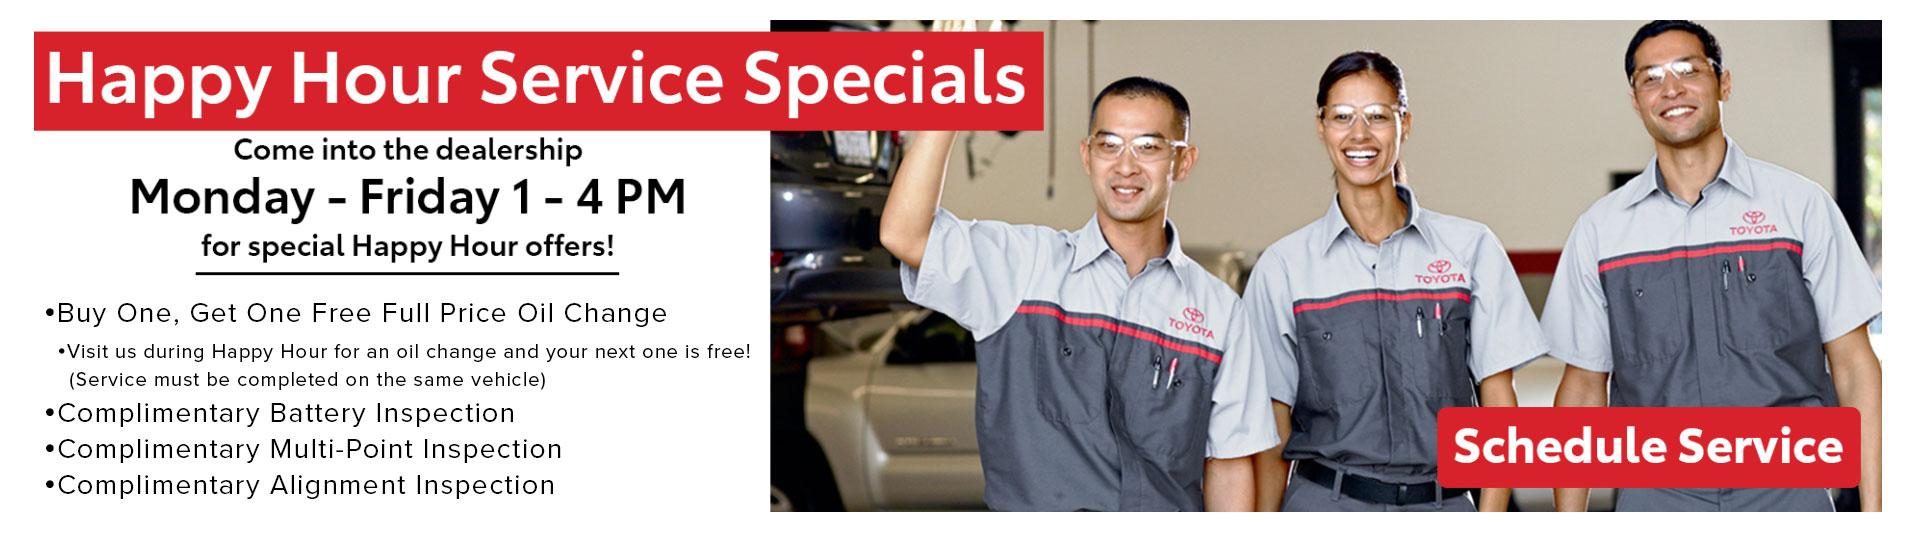 Toyota Happy Hour Specials